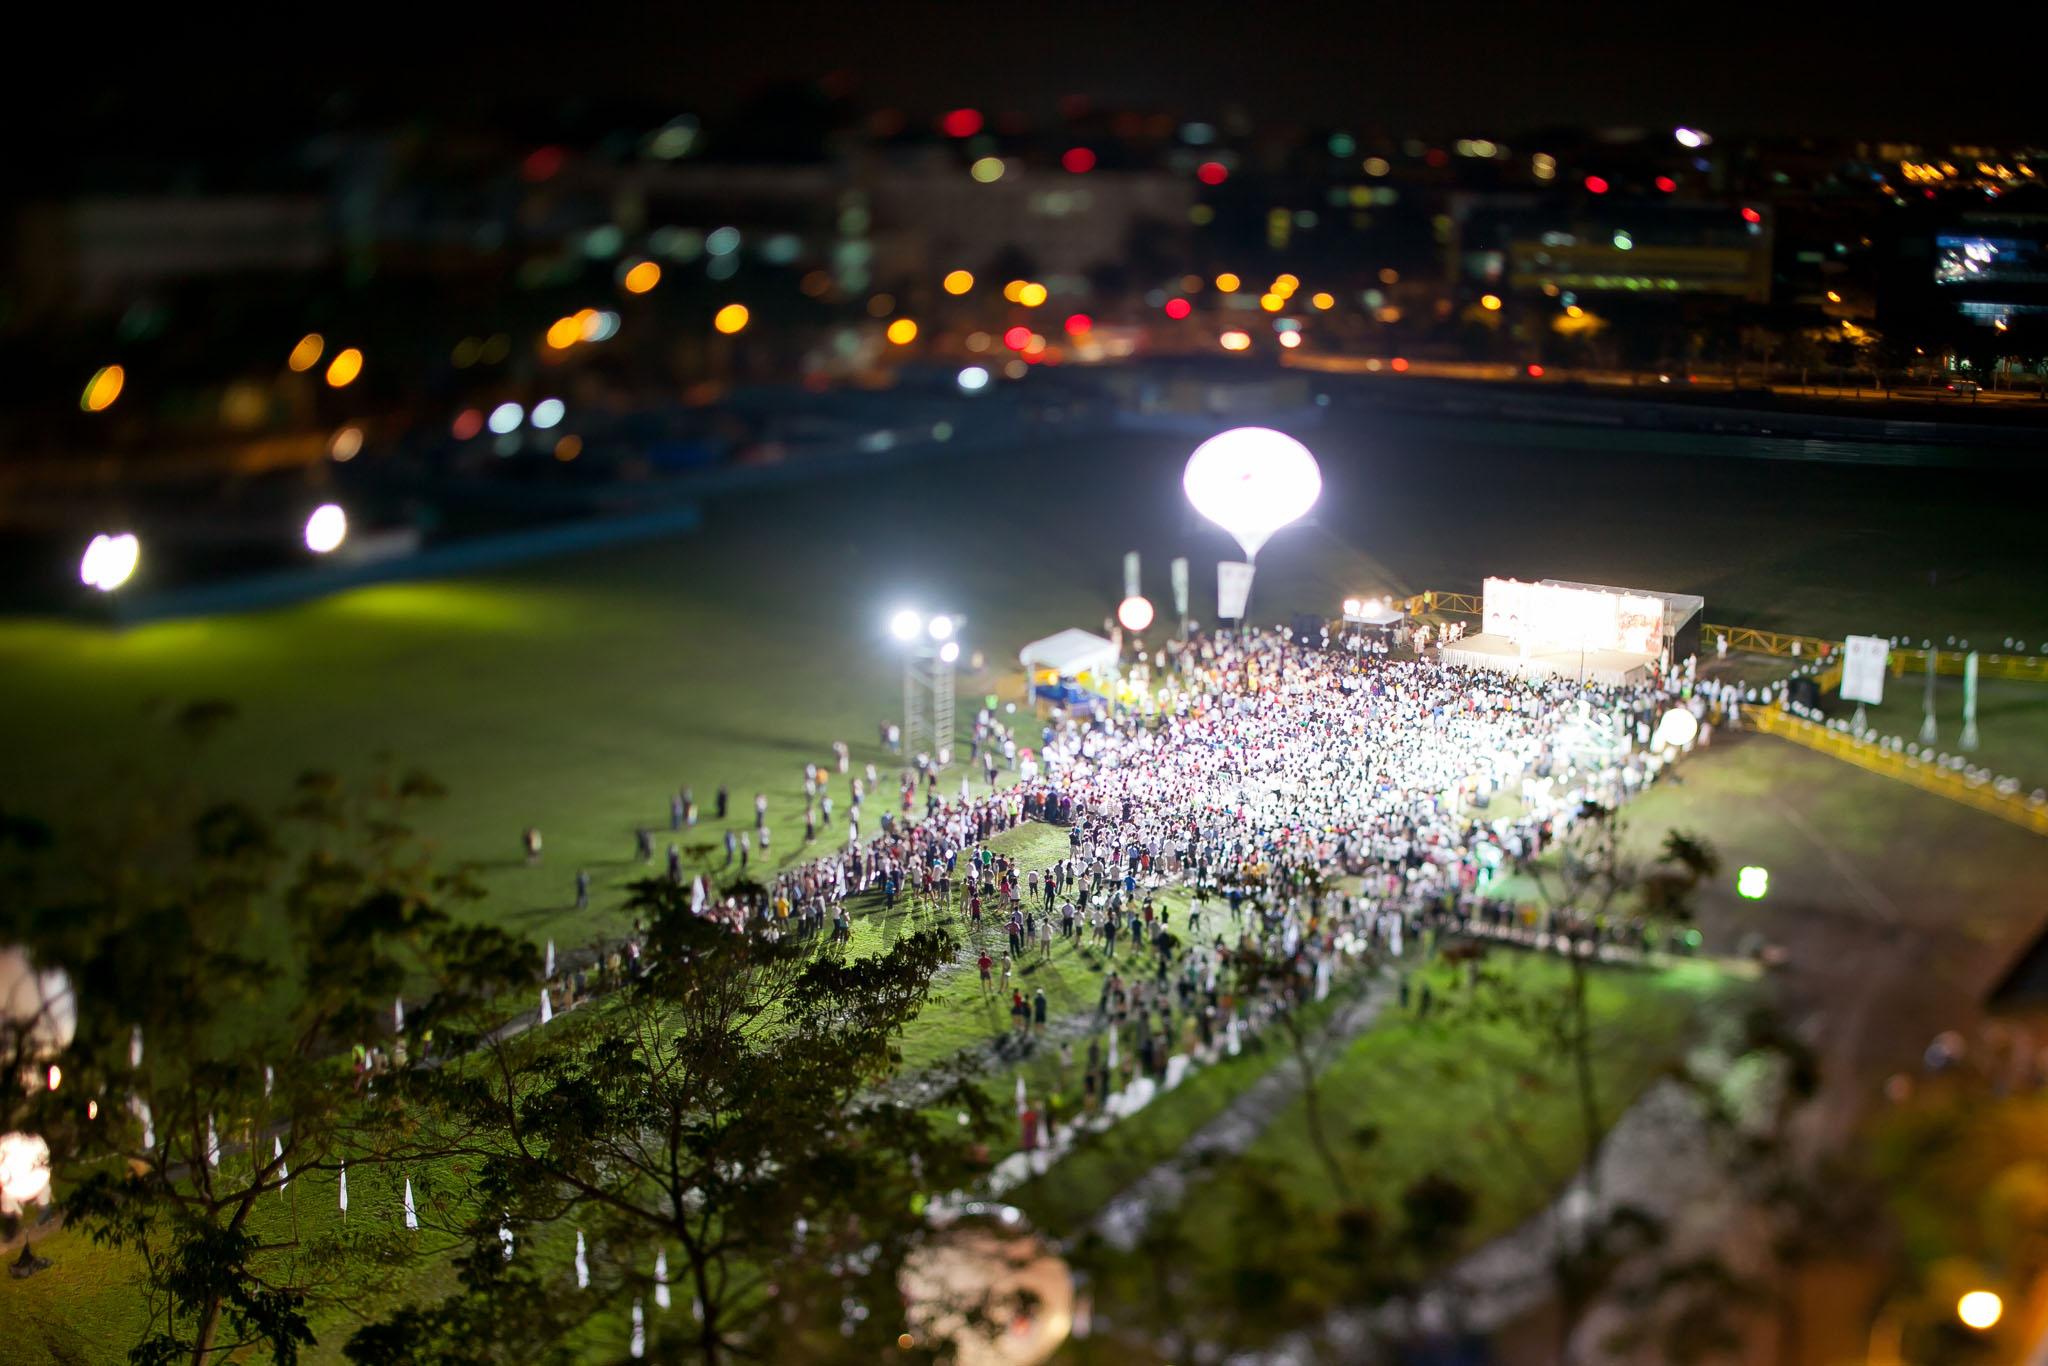 singapore-commercial-photographer-editorial-documentary-tiltshift-singaplural-zakaria-zainal-13.jpg